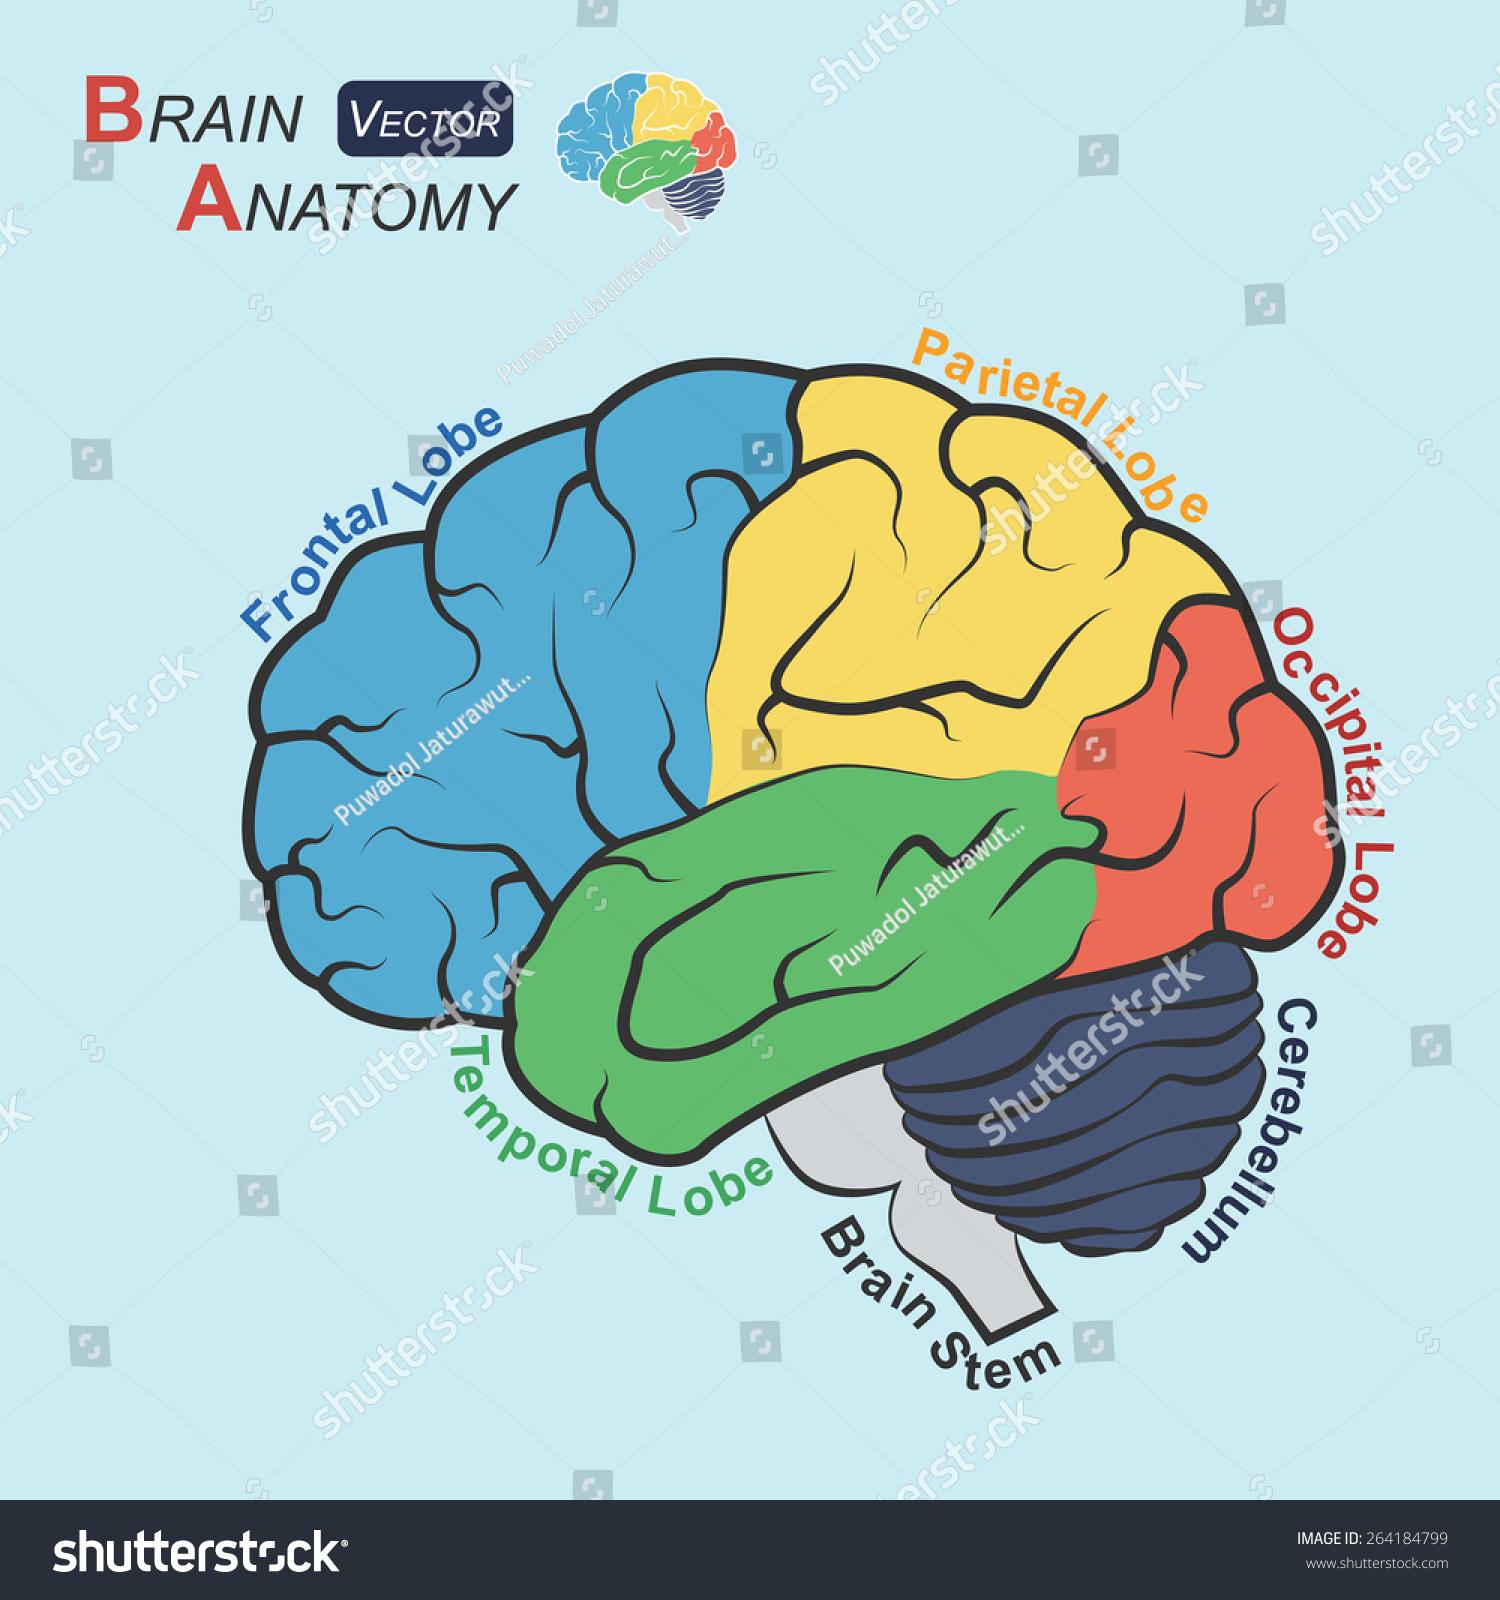 Brain Anatomy Flat Design Frontal Lobe Stock Vector 264184799